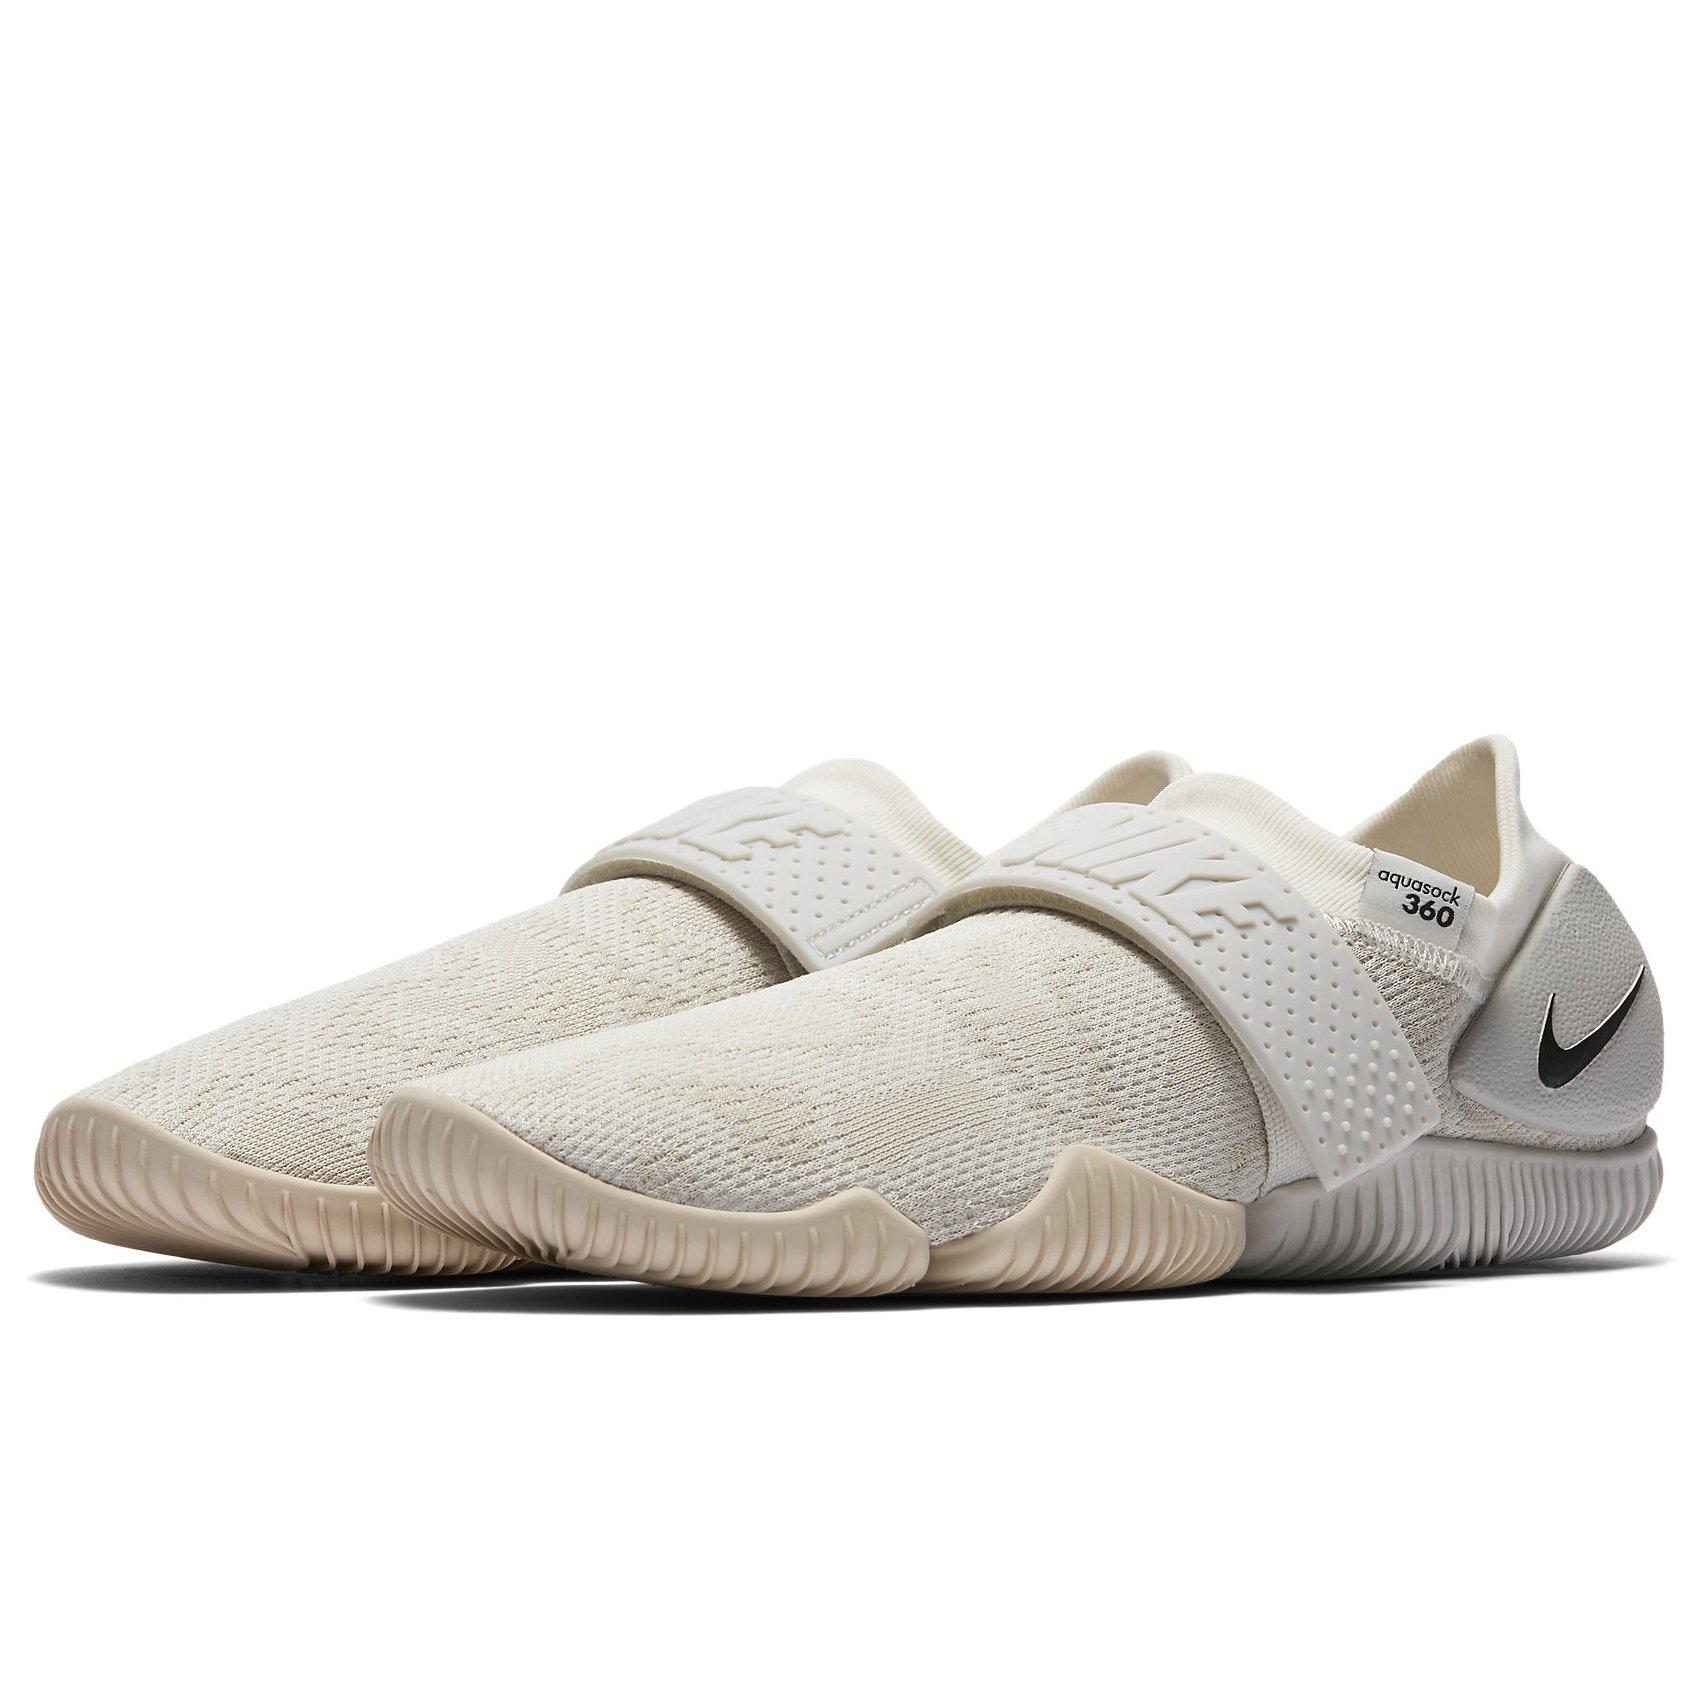 NIKE Aqua Sock 360 QS 902782 100 Oatmeal/Light Bone/Sail/Black Men's Water Shoes (8) by NIKE (Image #2)